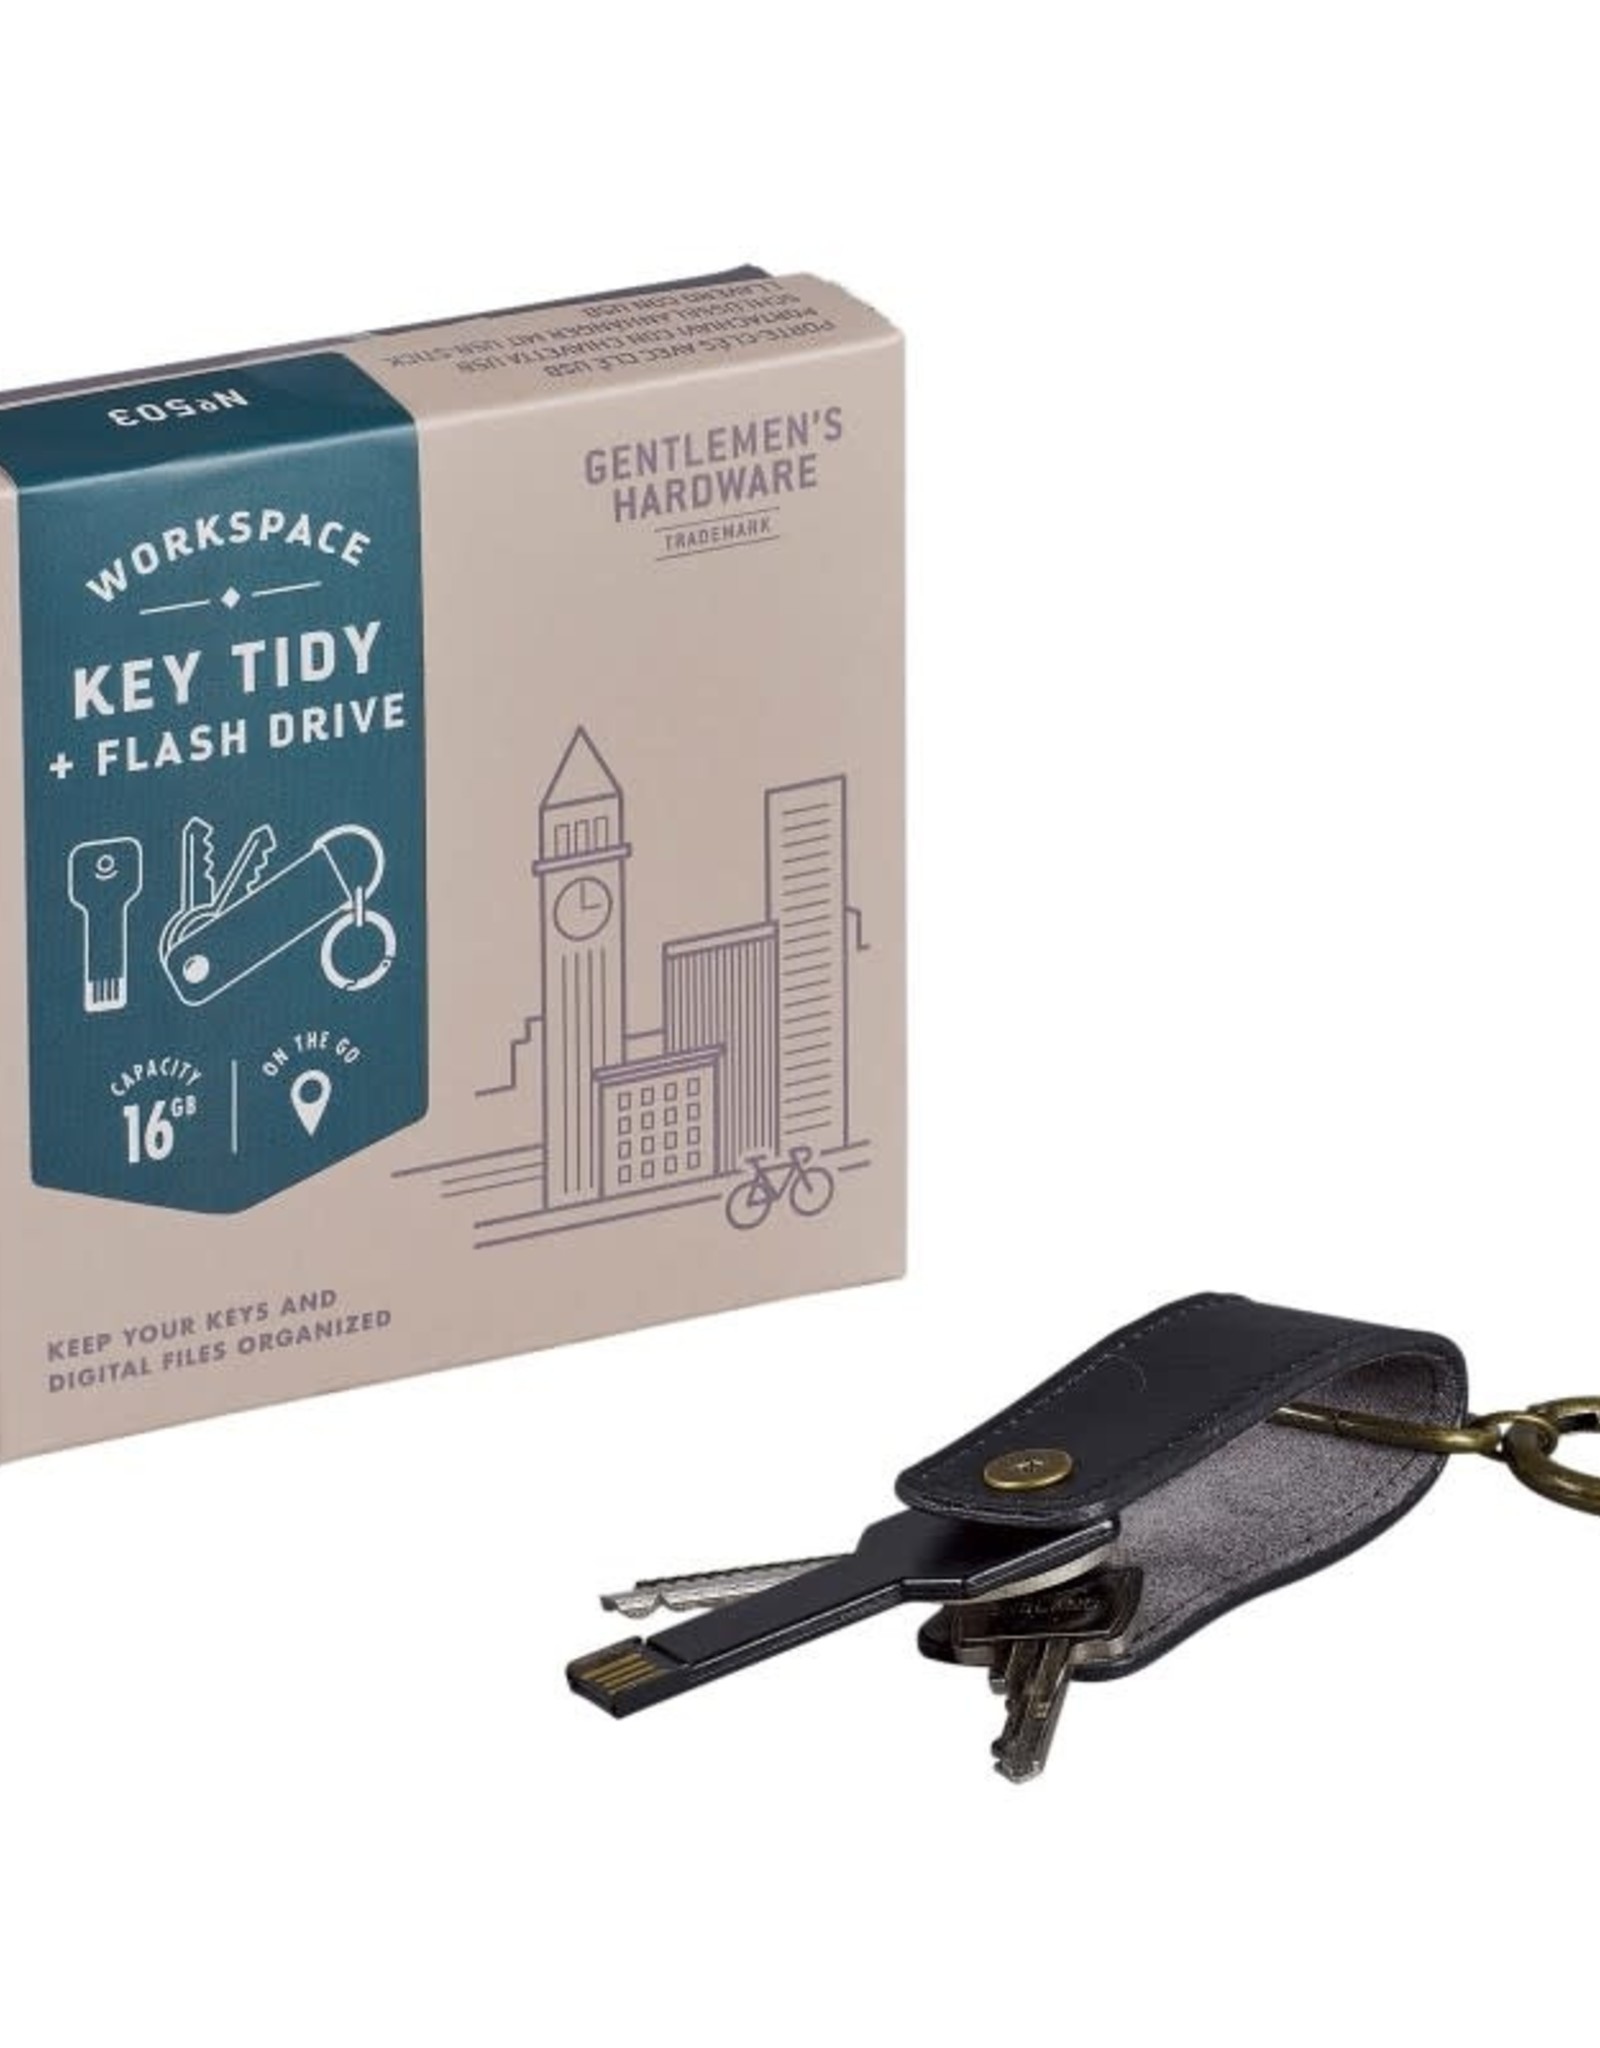 Gentlemen's Hardware Key Tidy with USB Flash Drive - 16GB